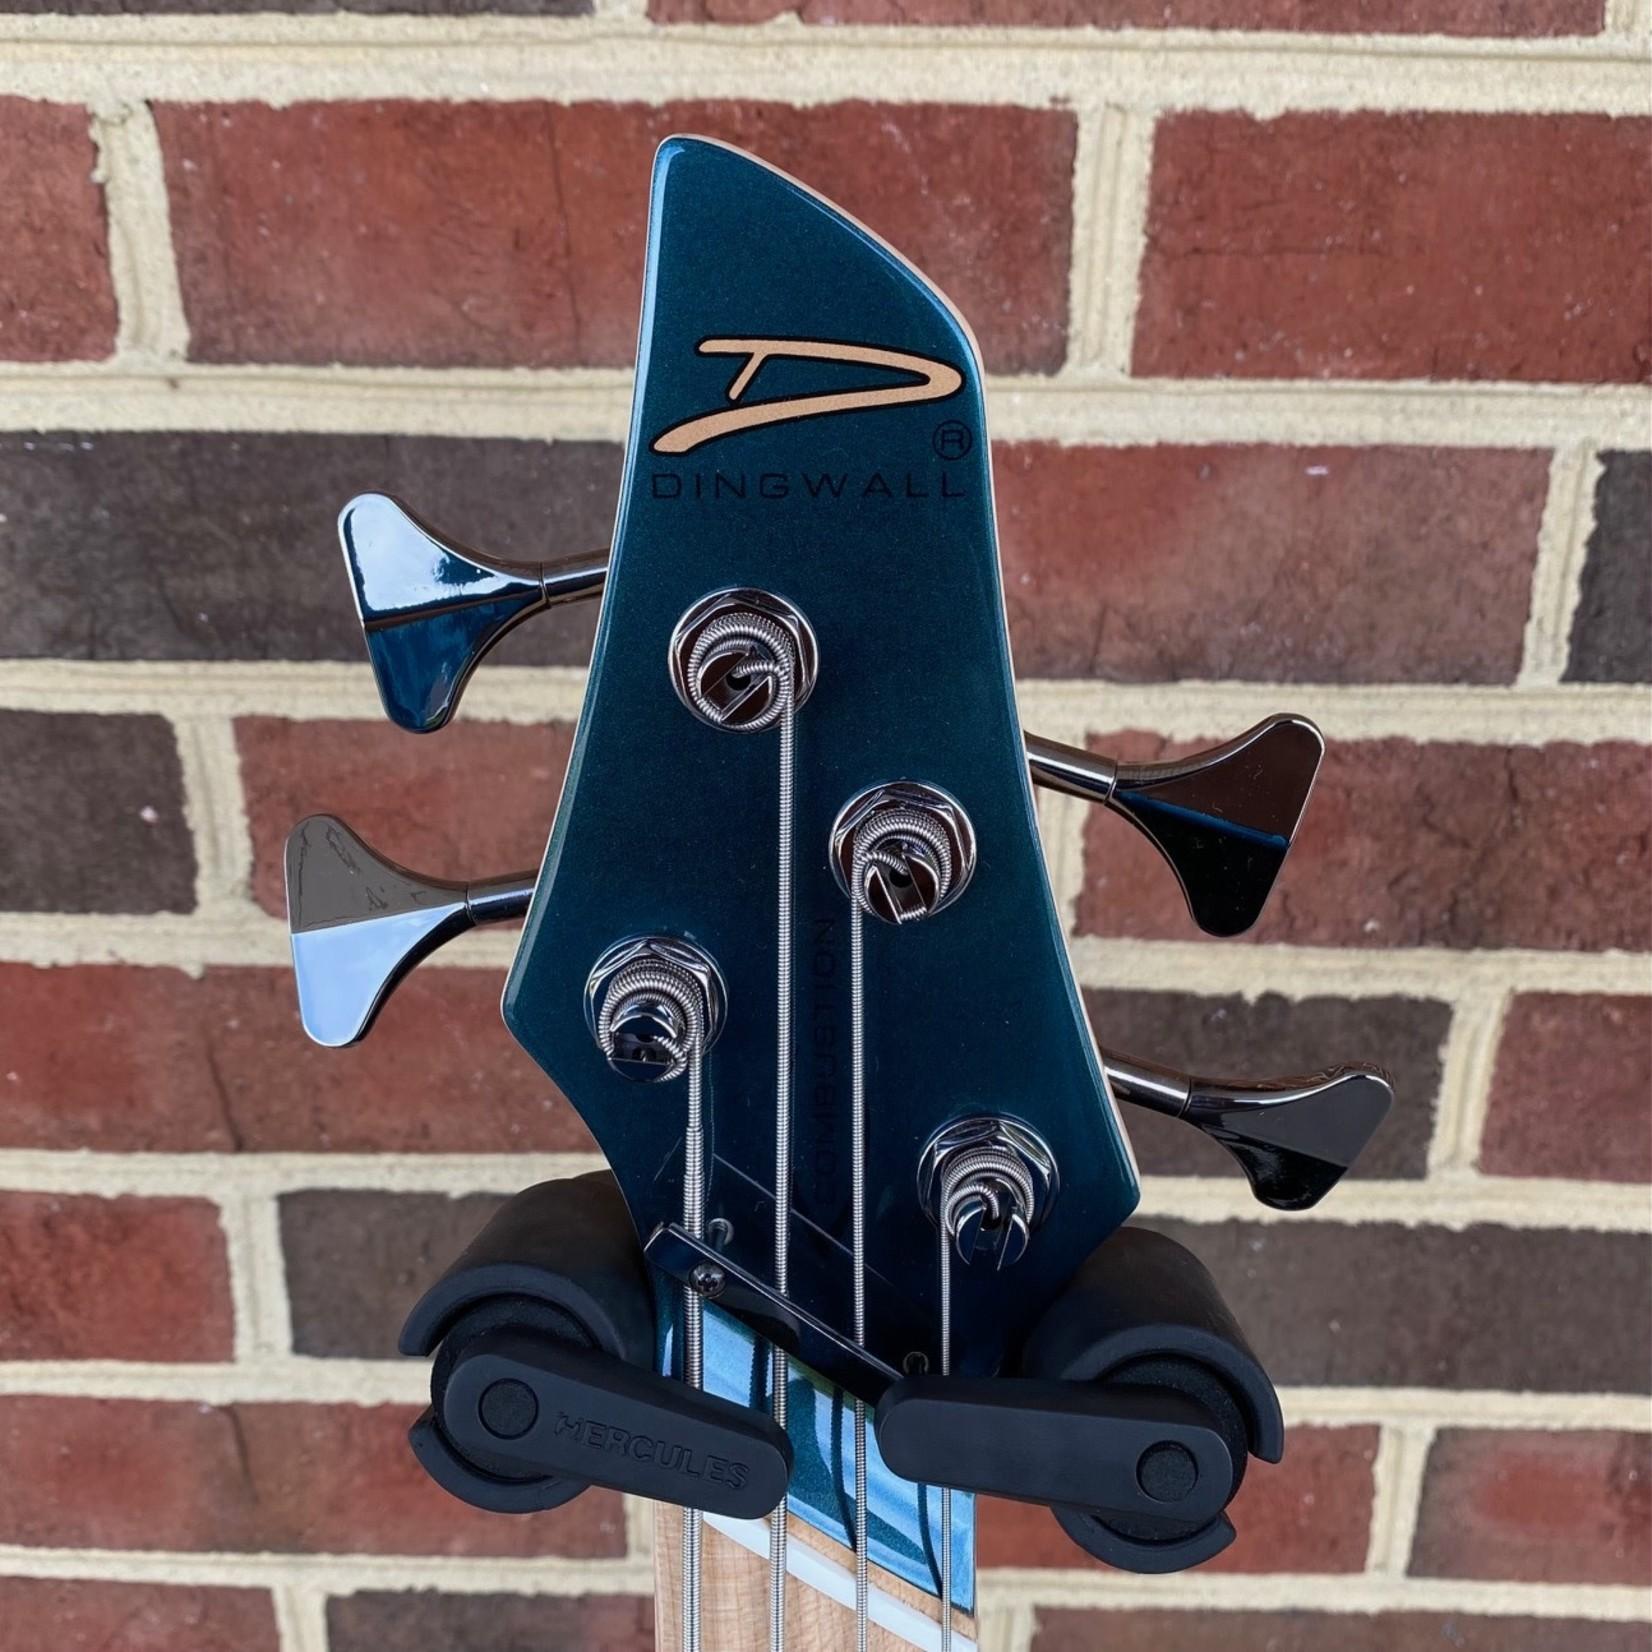 Dingwall Dingwall NG3 4-String, Gloss Black Forest Green, Maple Fretboard, Matching Headstock, Dingwall Gig Bag, SN# 9221